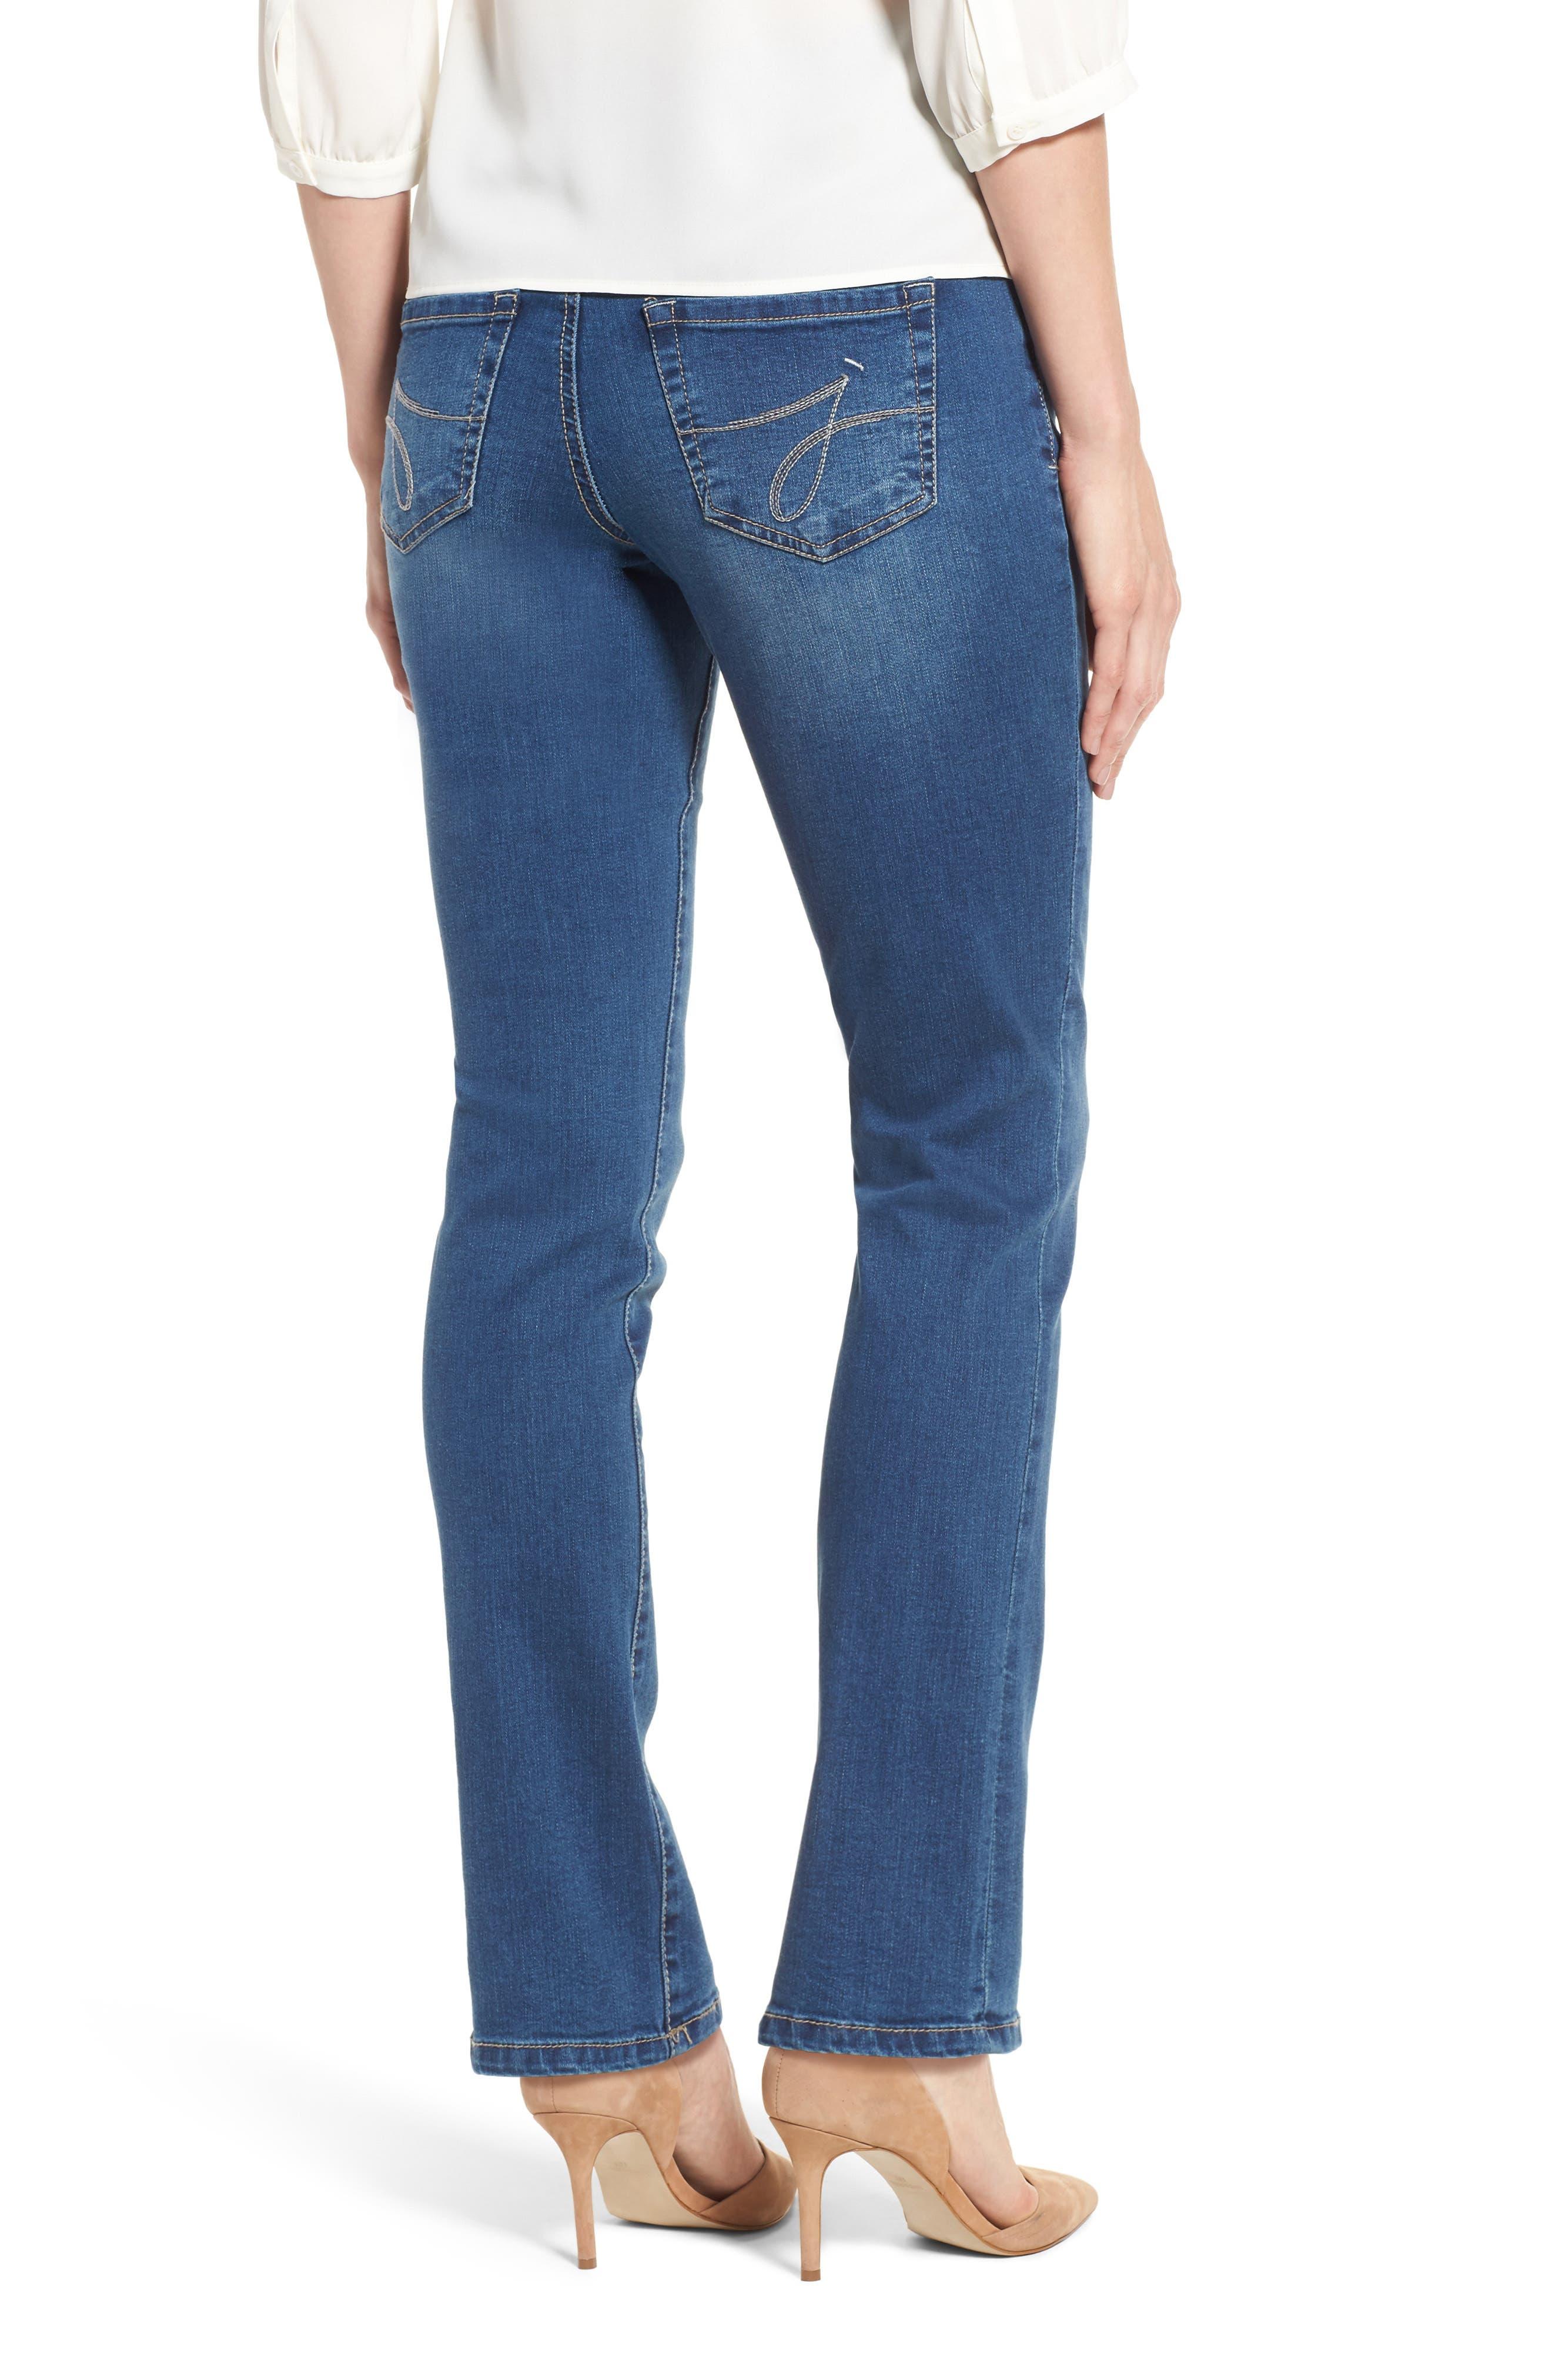 JAG JEANS, Peri Pull-On Straight Leg Jeans, Alternate thumbnail 2, color, MEDIUM INDIGO